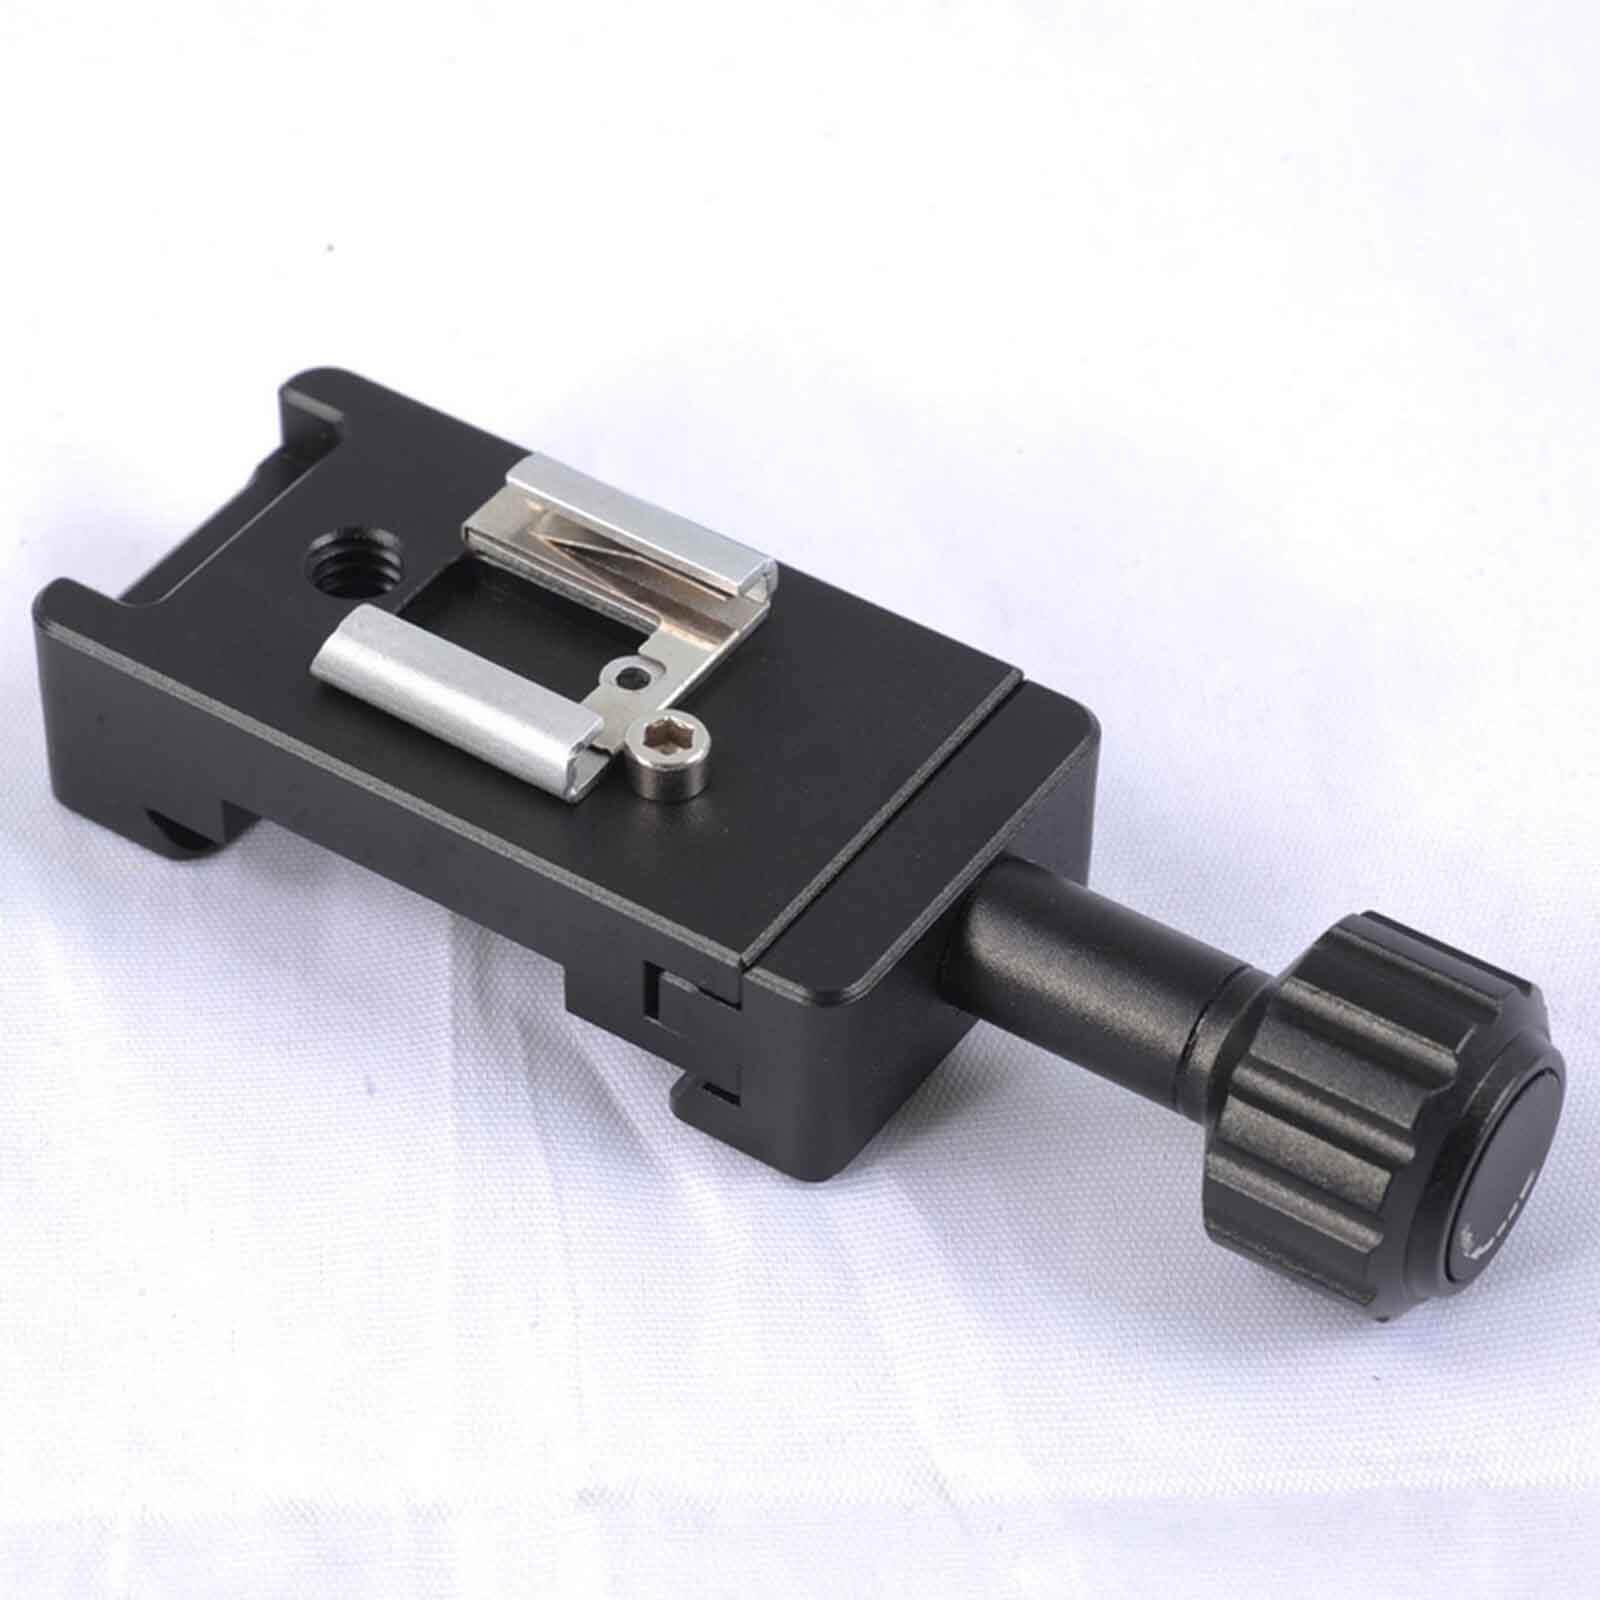 Clamp Shoe Mount Speedlite Flash bracket for Camera L Quick Release Plate